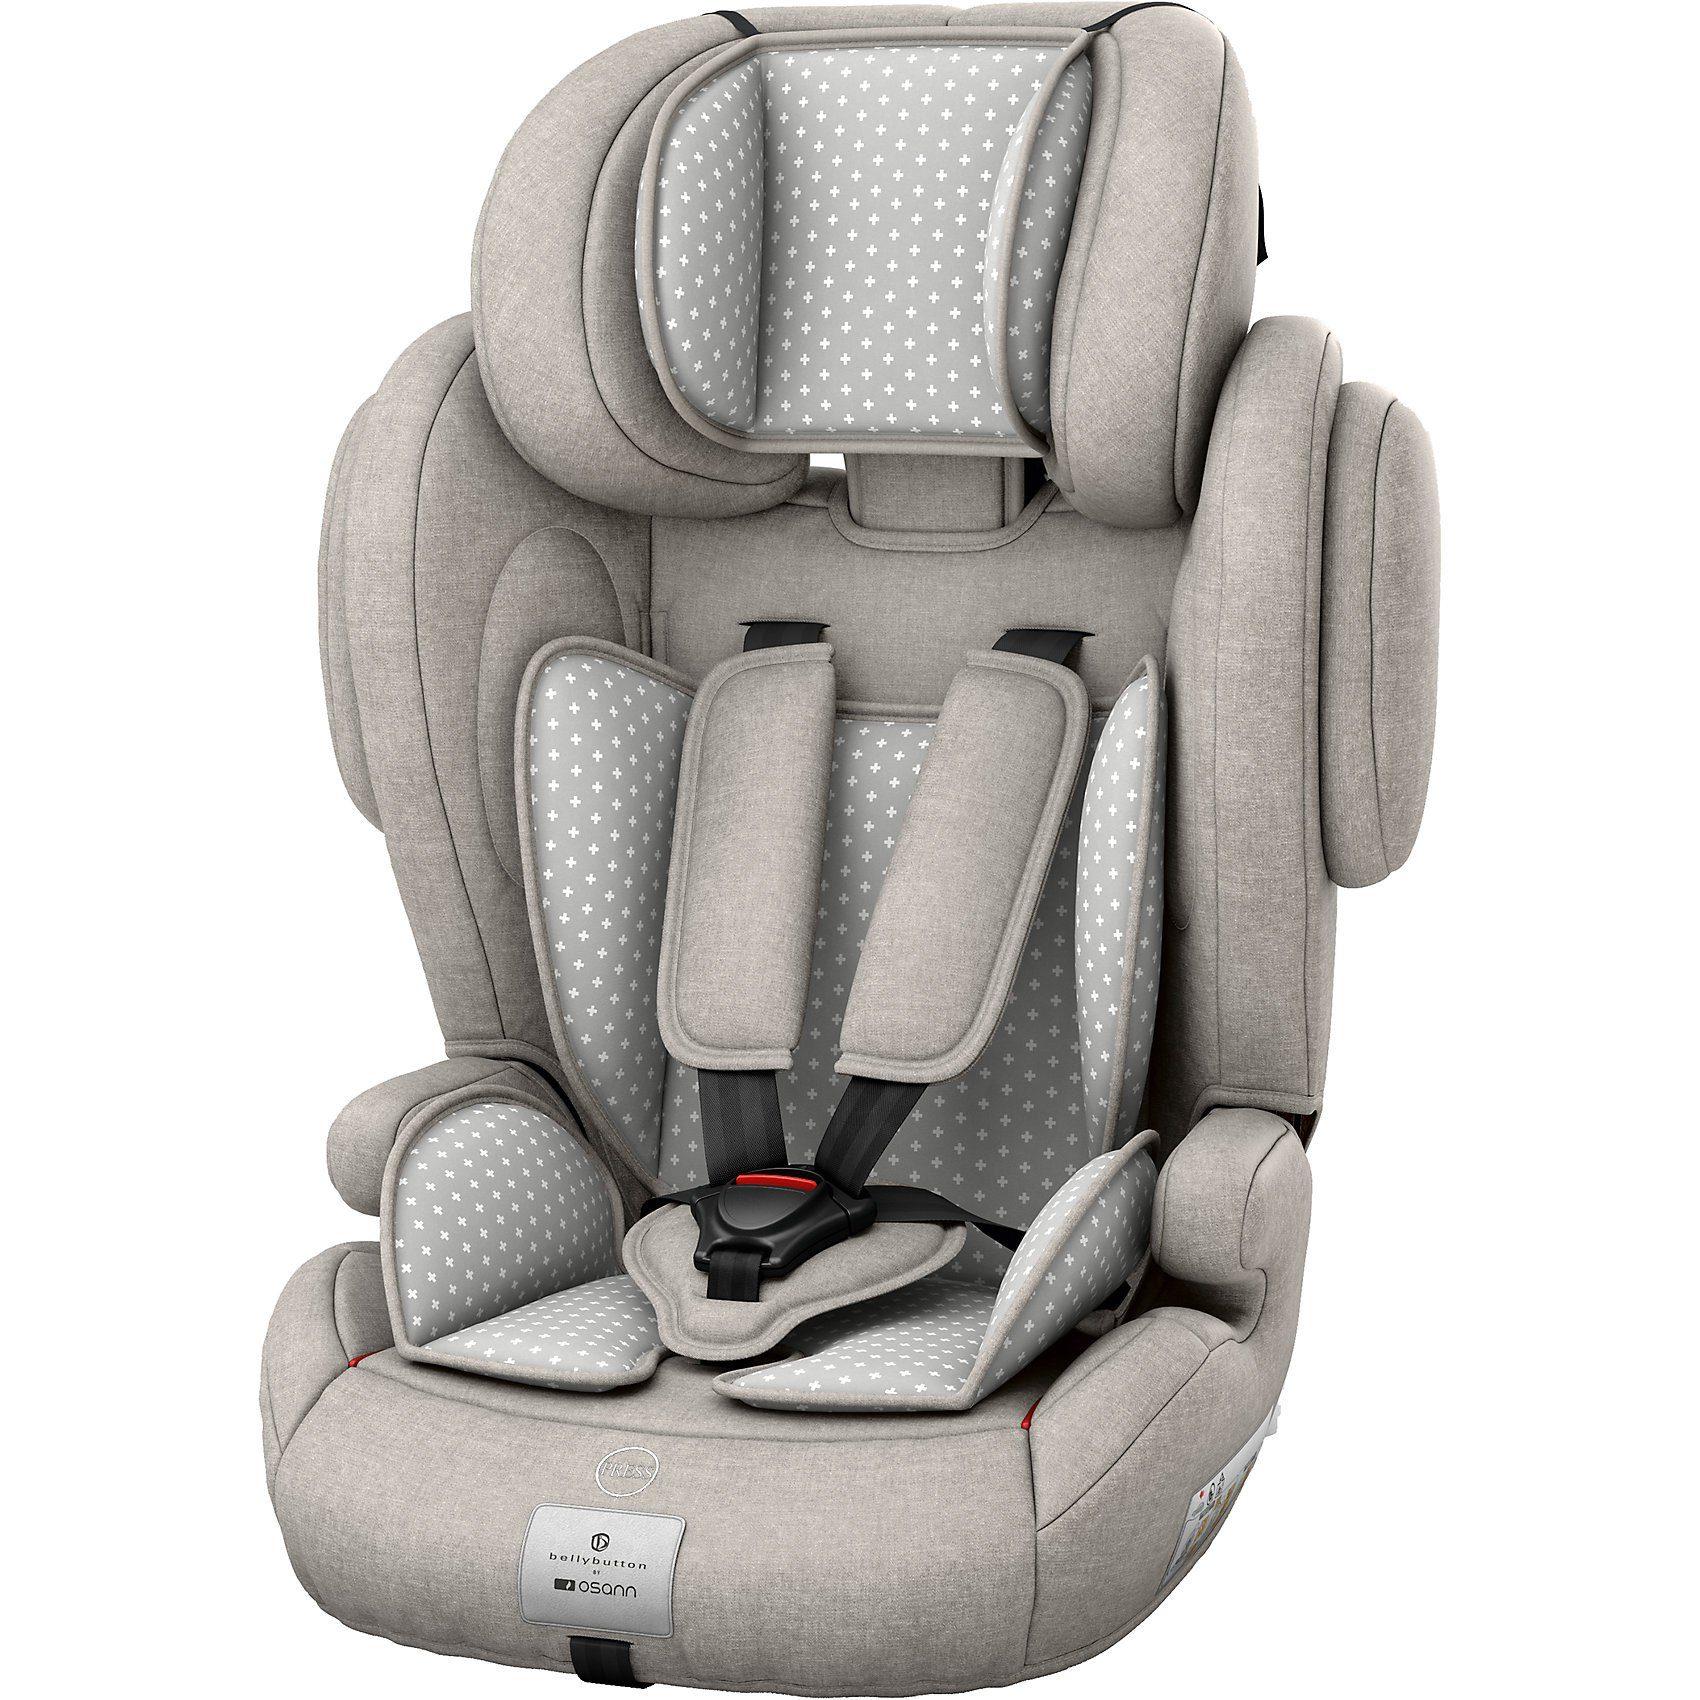 Osann Auto-Kindersitz Flux Plus, bellybutton, Silver Cloud, 2018